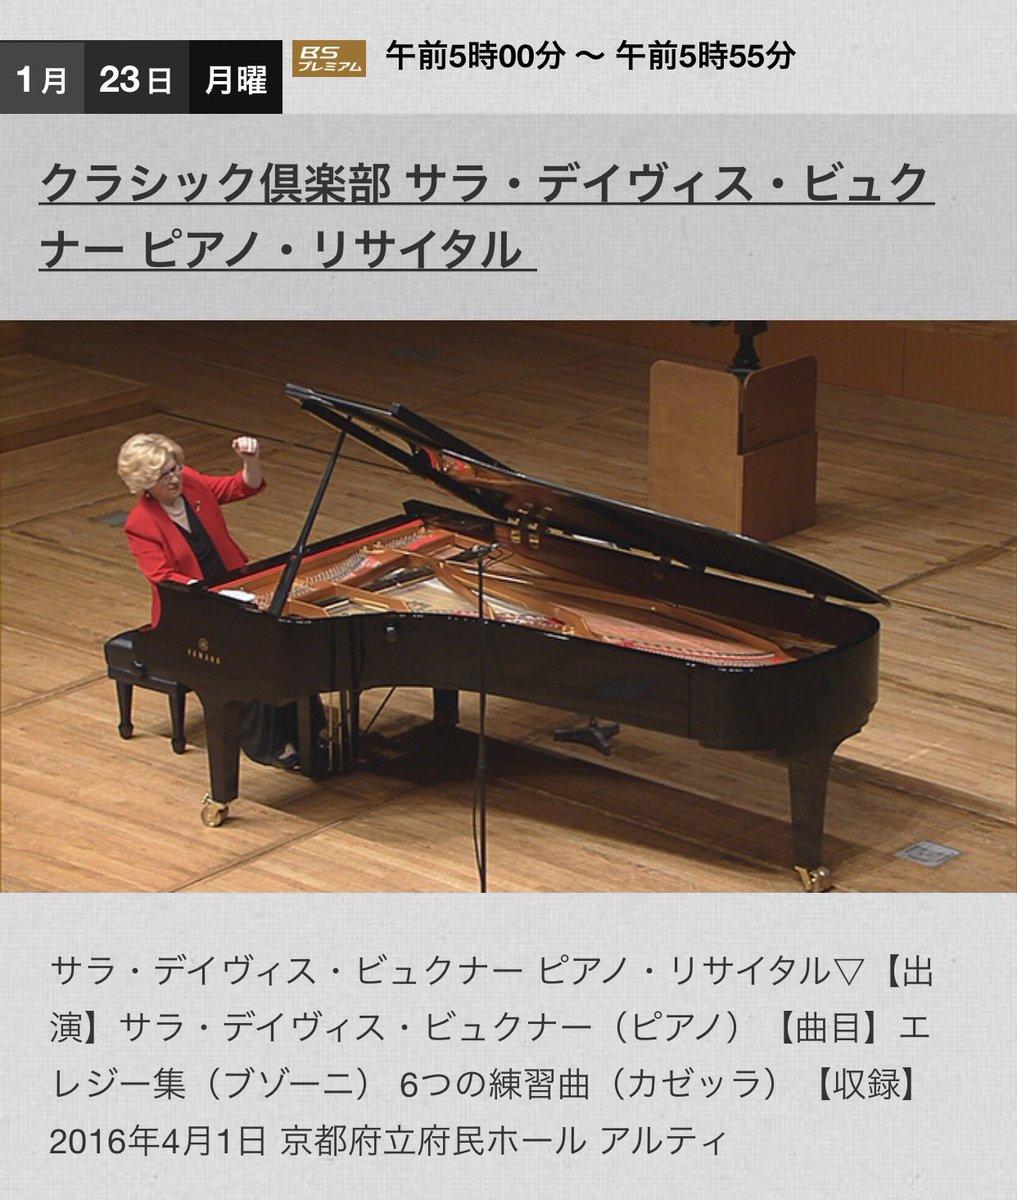 安嶋健太郎 pianist on Twitter:...